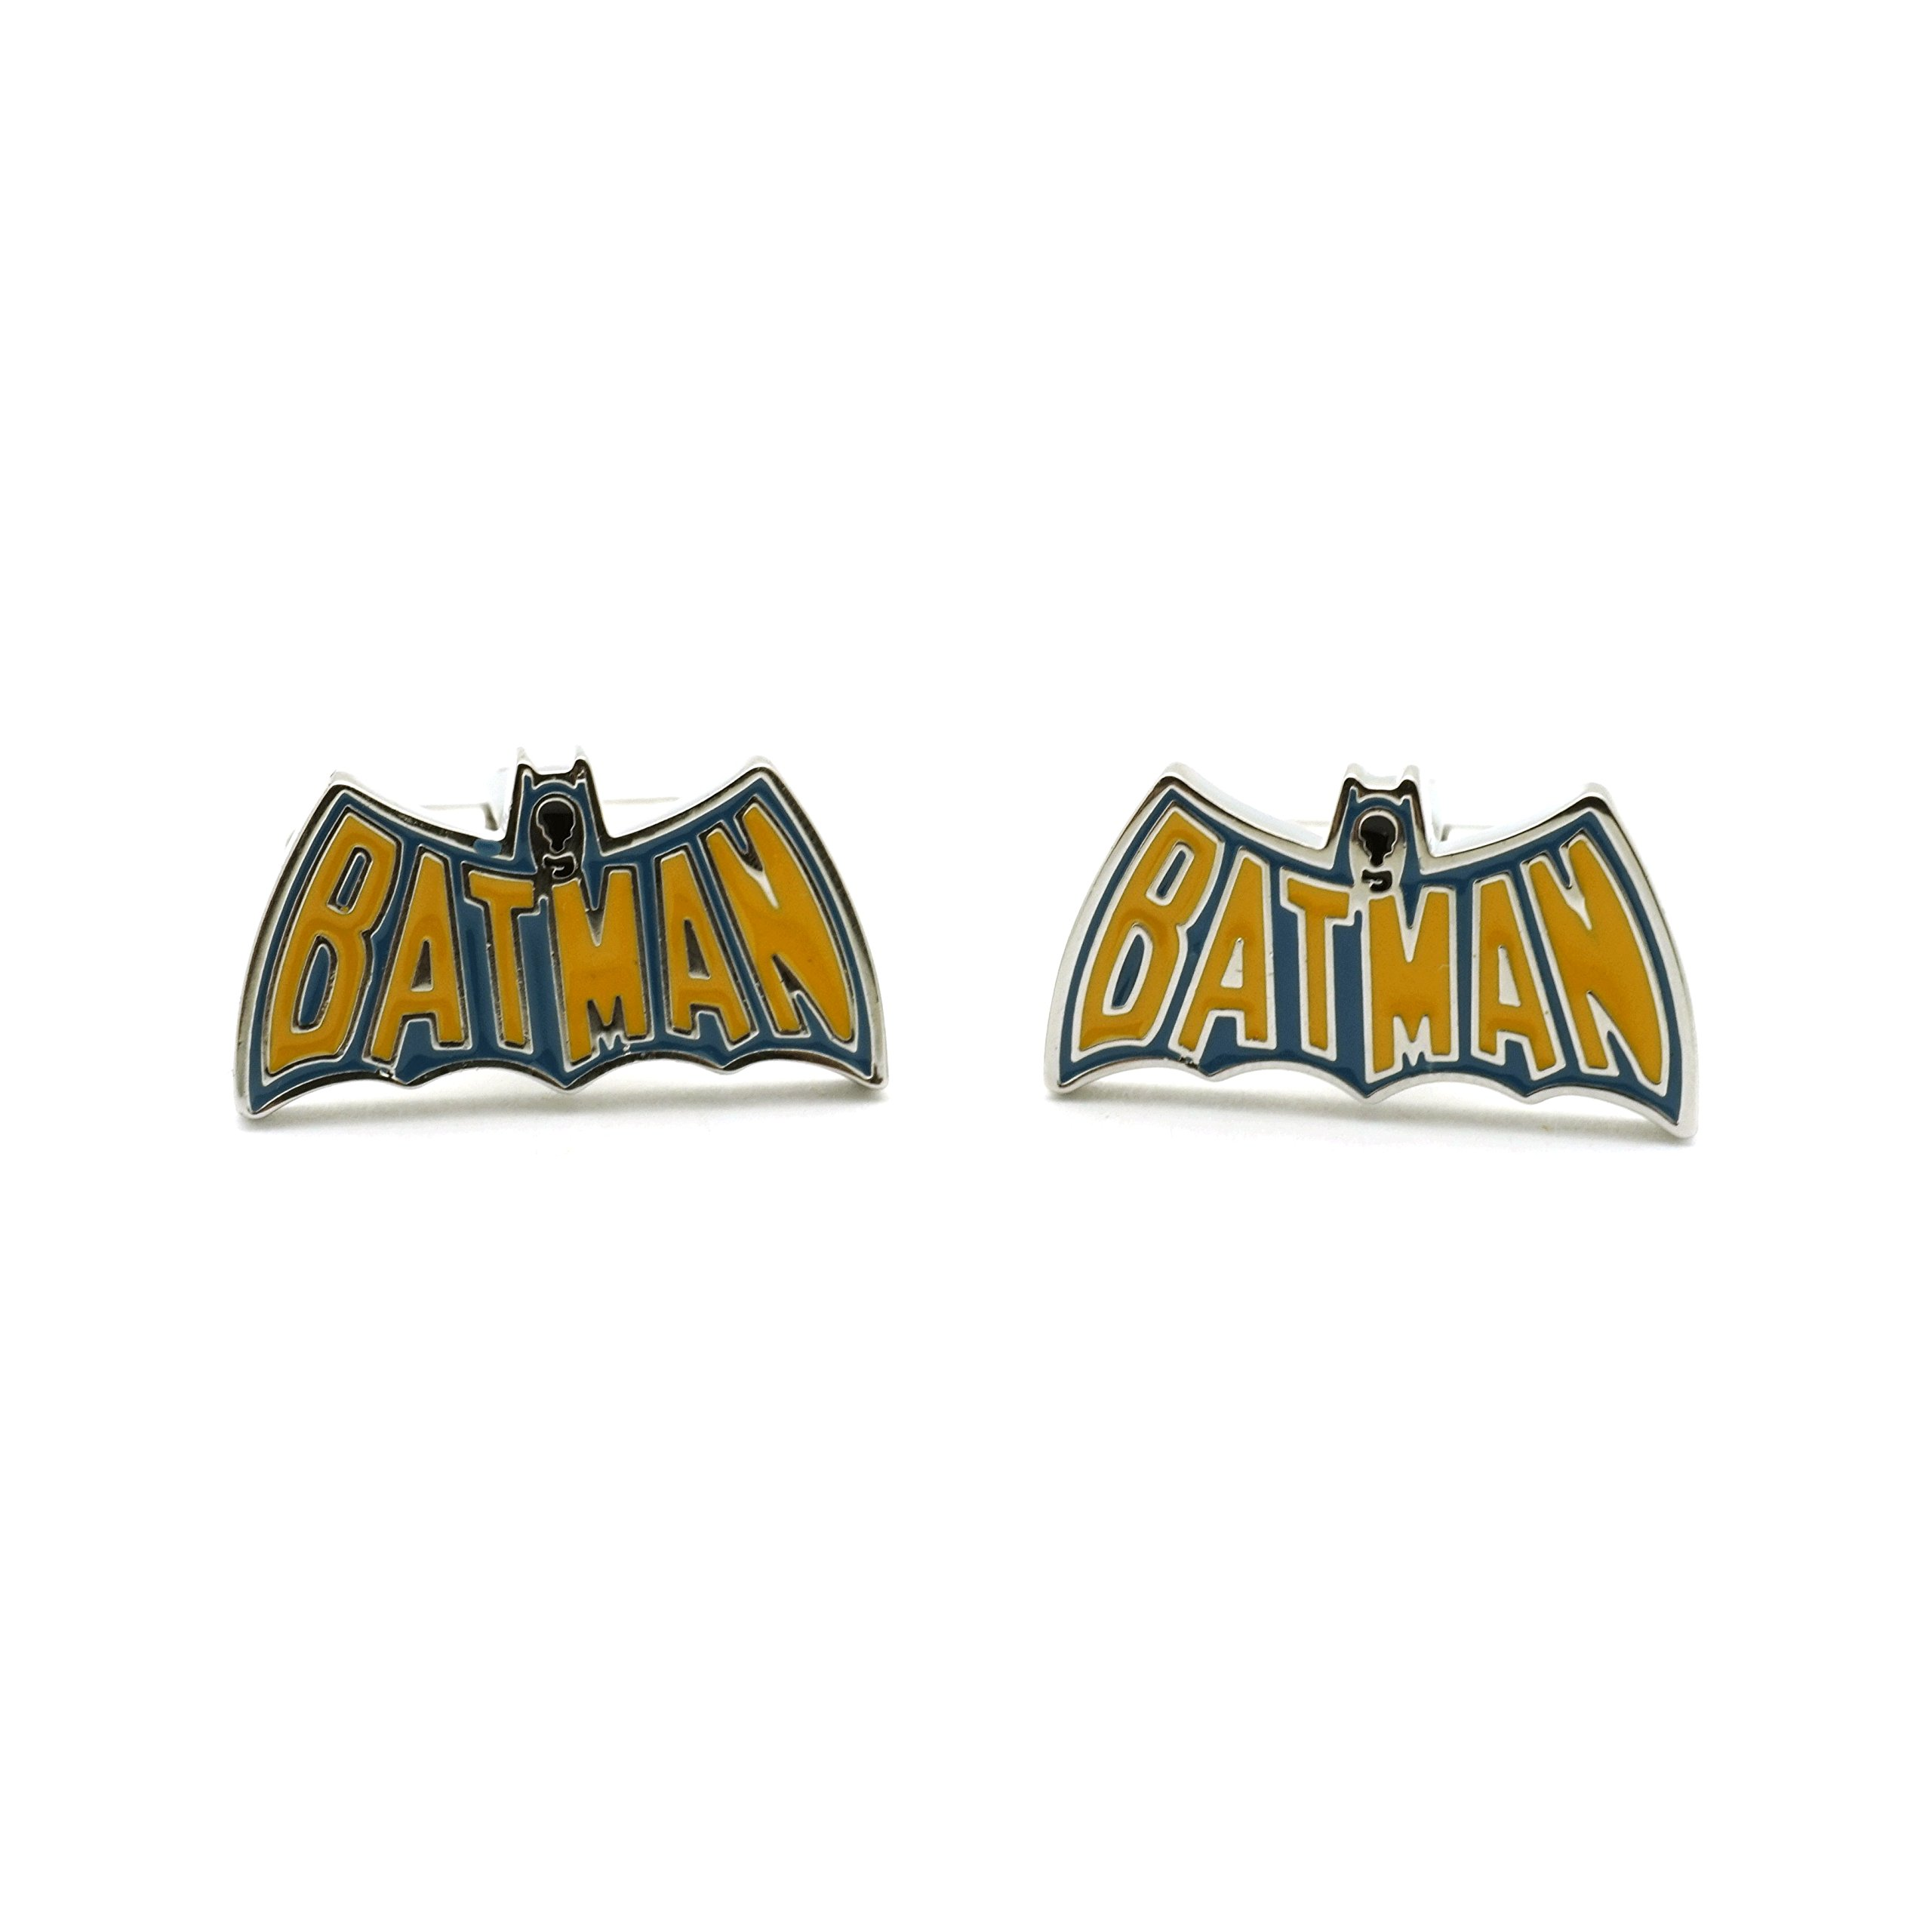 Teri's Boutique Super Hero Batman Men's Fashion Jewelry Wedding Business Cuff Links w/ Gift Box (Blue Yellow)